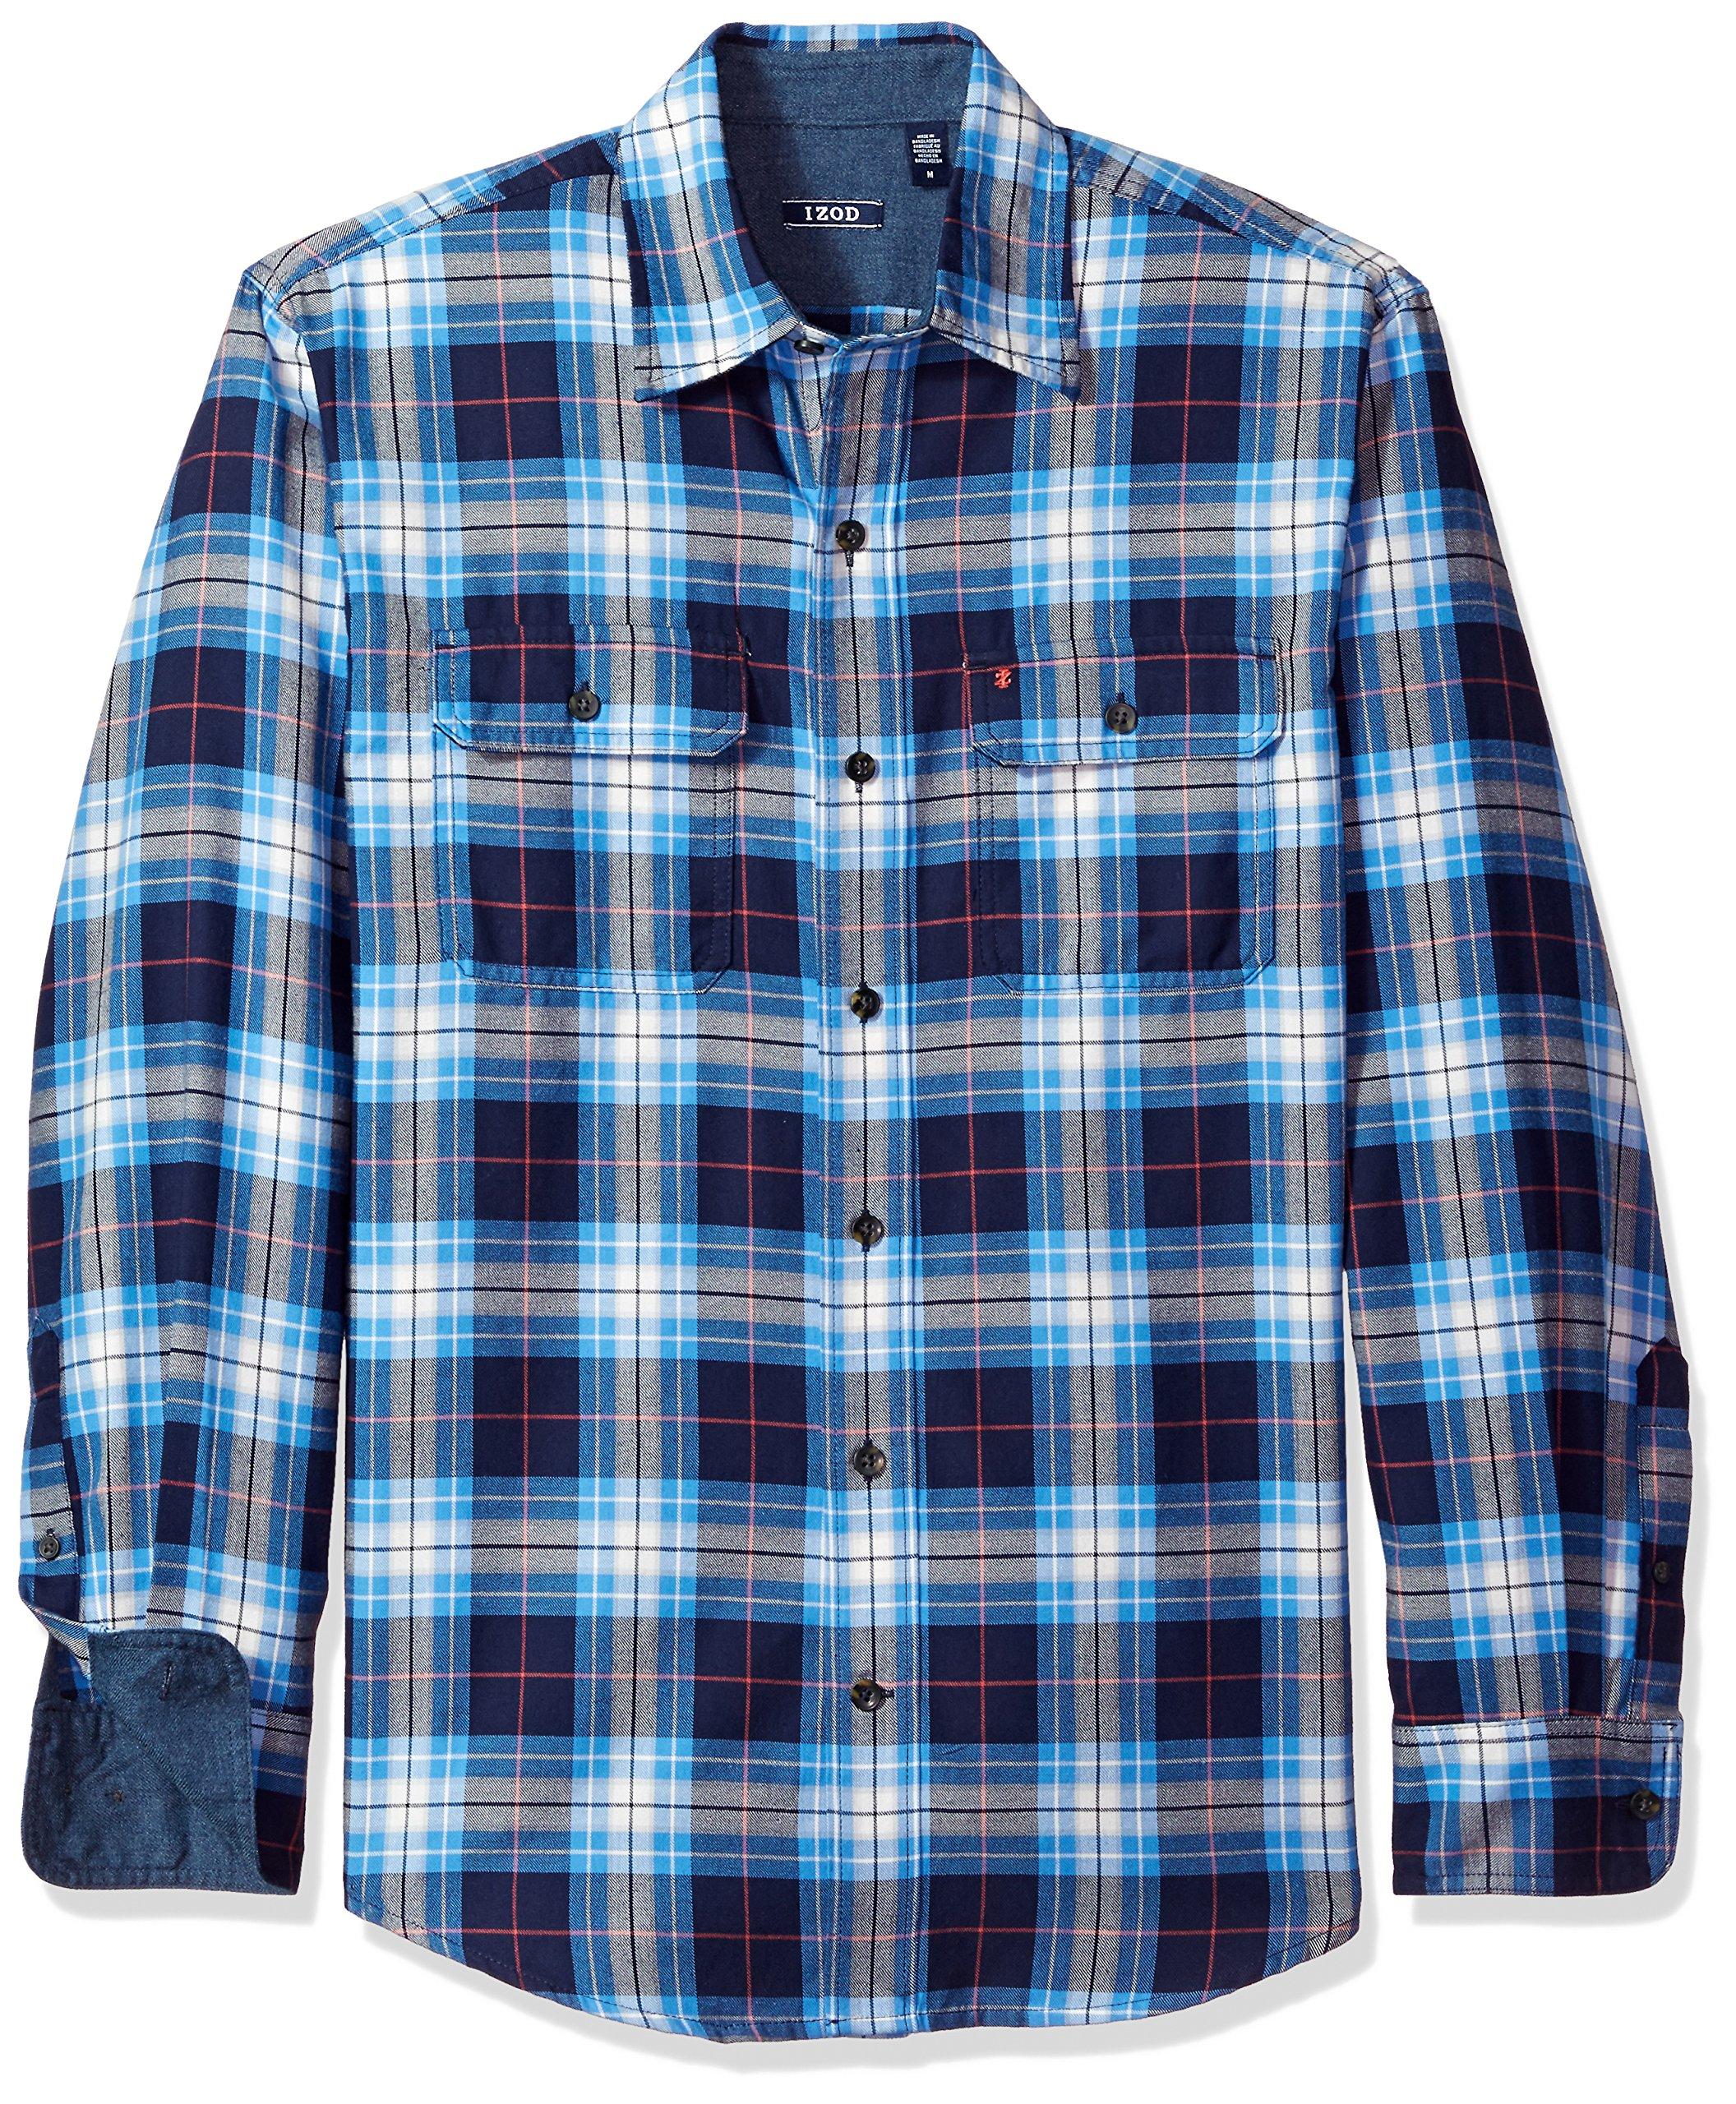 IZOD Men's Long Sleeve Saltwater Twill Easycare Plaid Shirt, Peacoat, 2X-Large